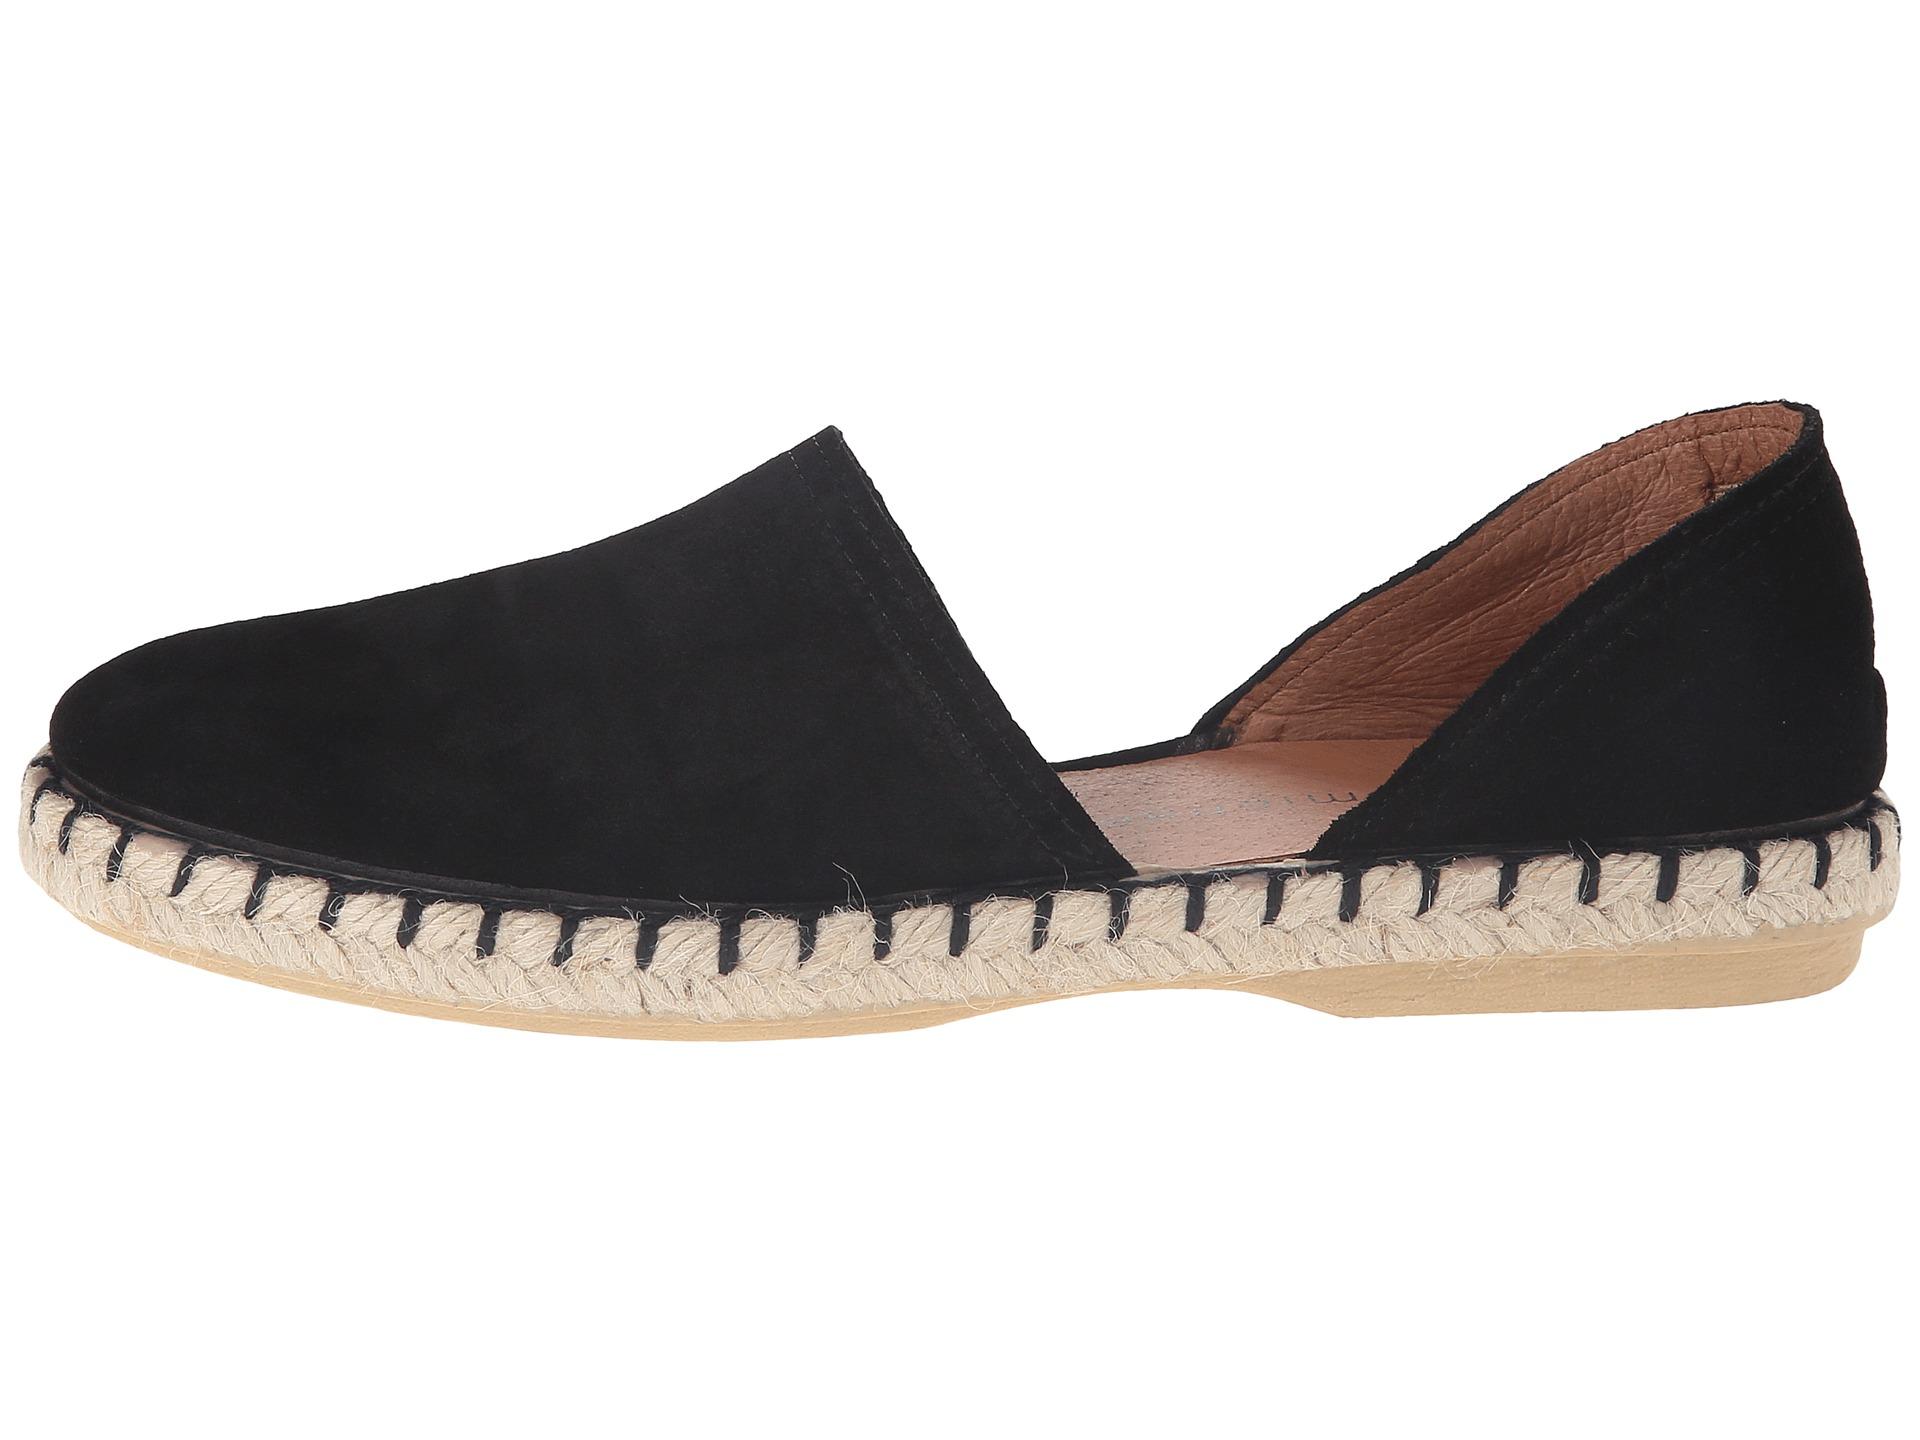 Eric Michael Shoes Size Chart